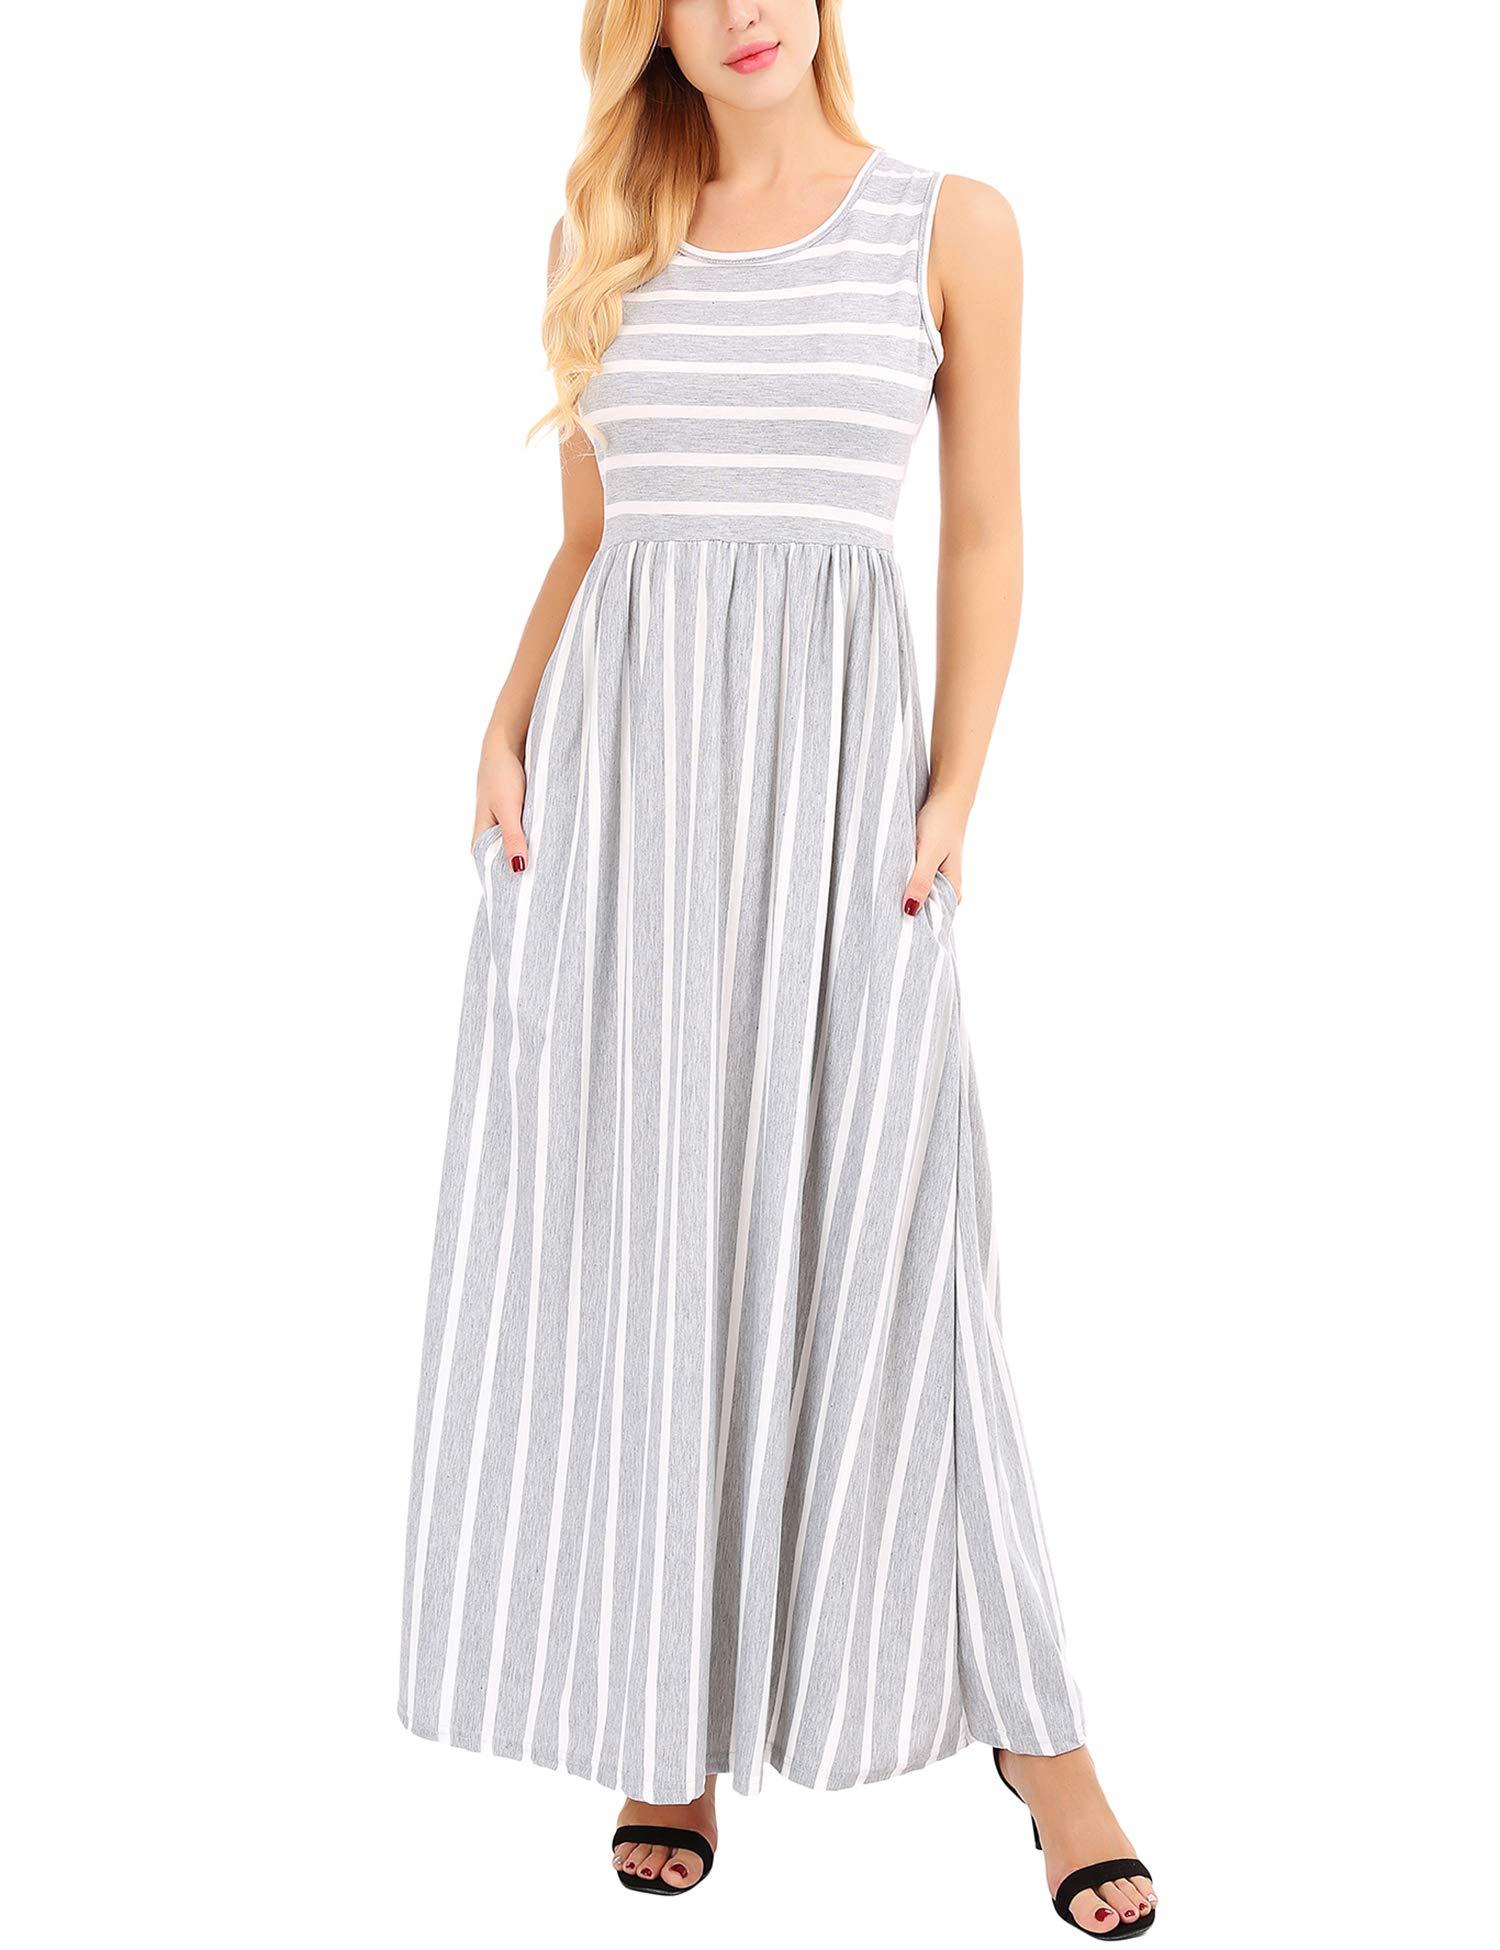 FISOUL Women Summer Striped Loose Swing T-Shirt Midi Dress with Pockets Grey XXL